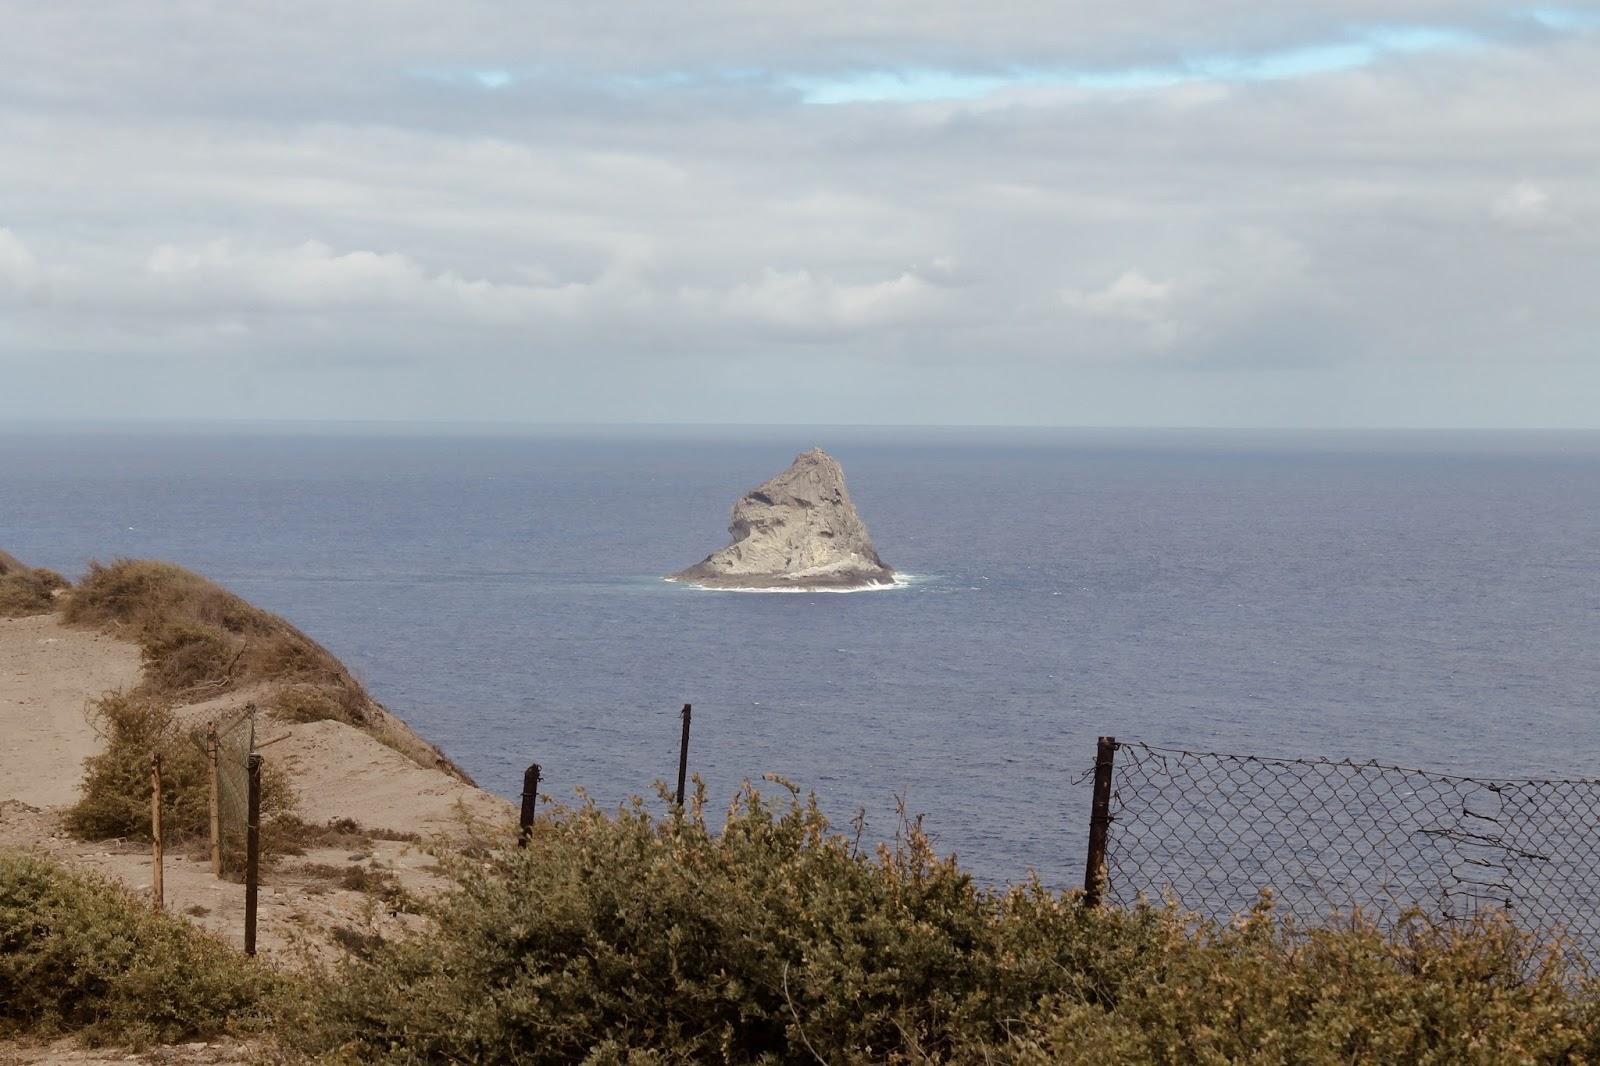 PORTO SANTO | TRAVELS